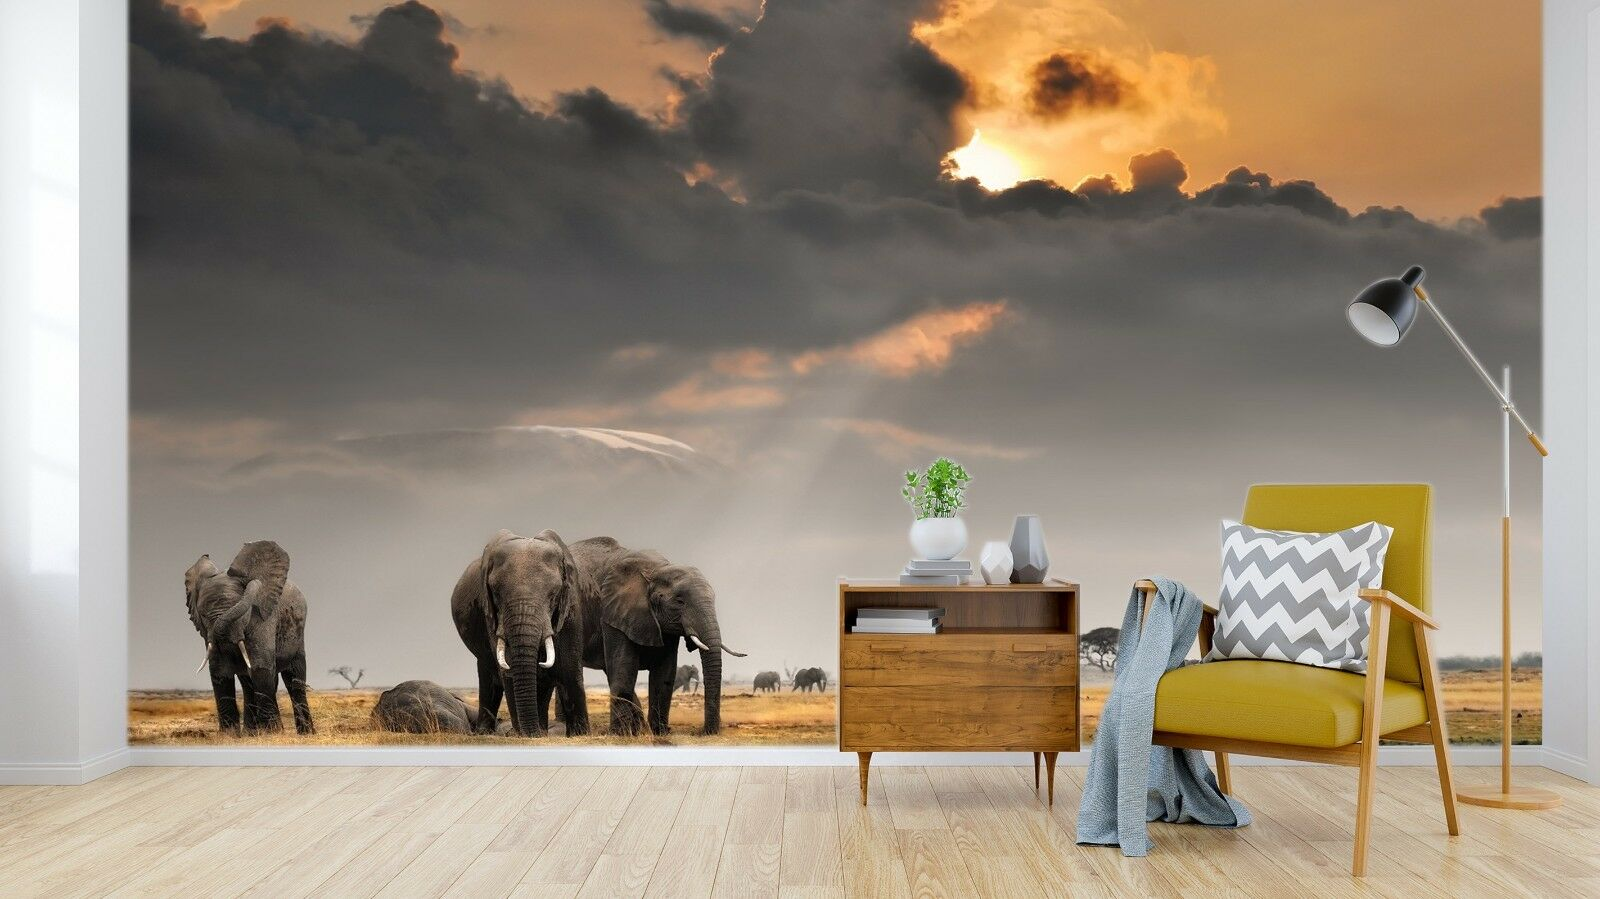 3D Elephant Meadow 87 Wallpaper Mural Paper Wall Print Murals UK Sidney